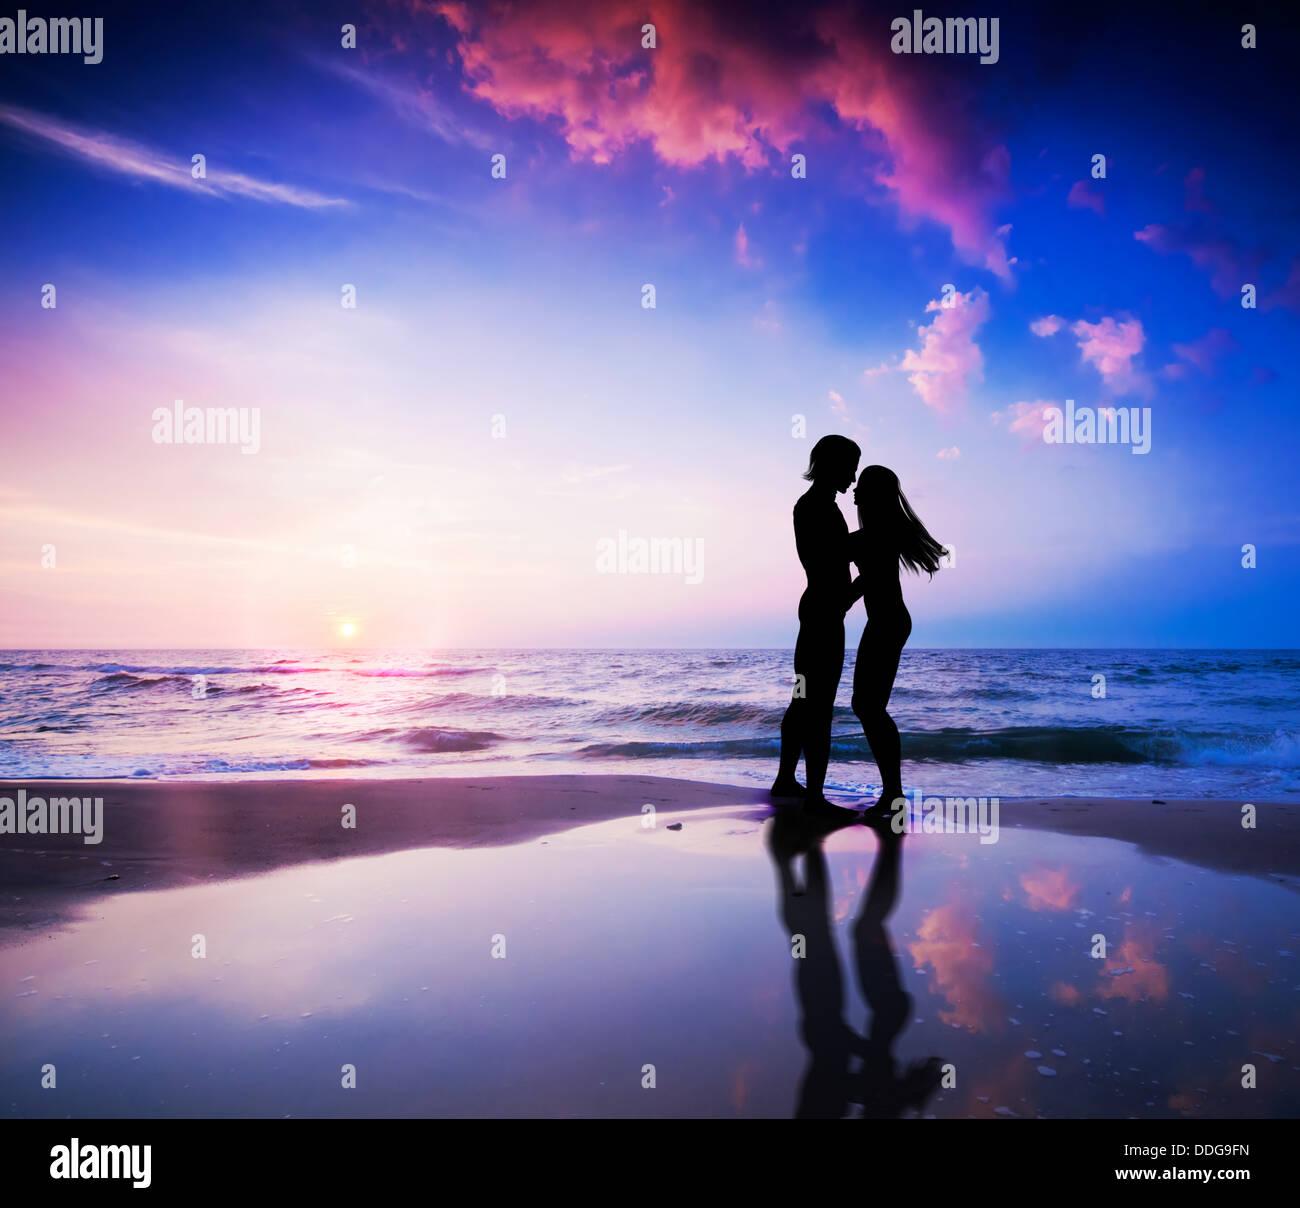 Romântico casal sobre a kiss na praia ao pôr-do-sol Imagens de Stock